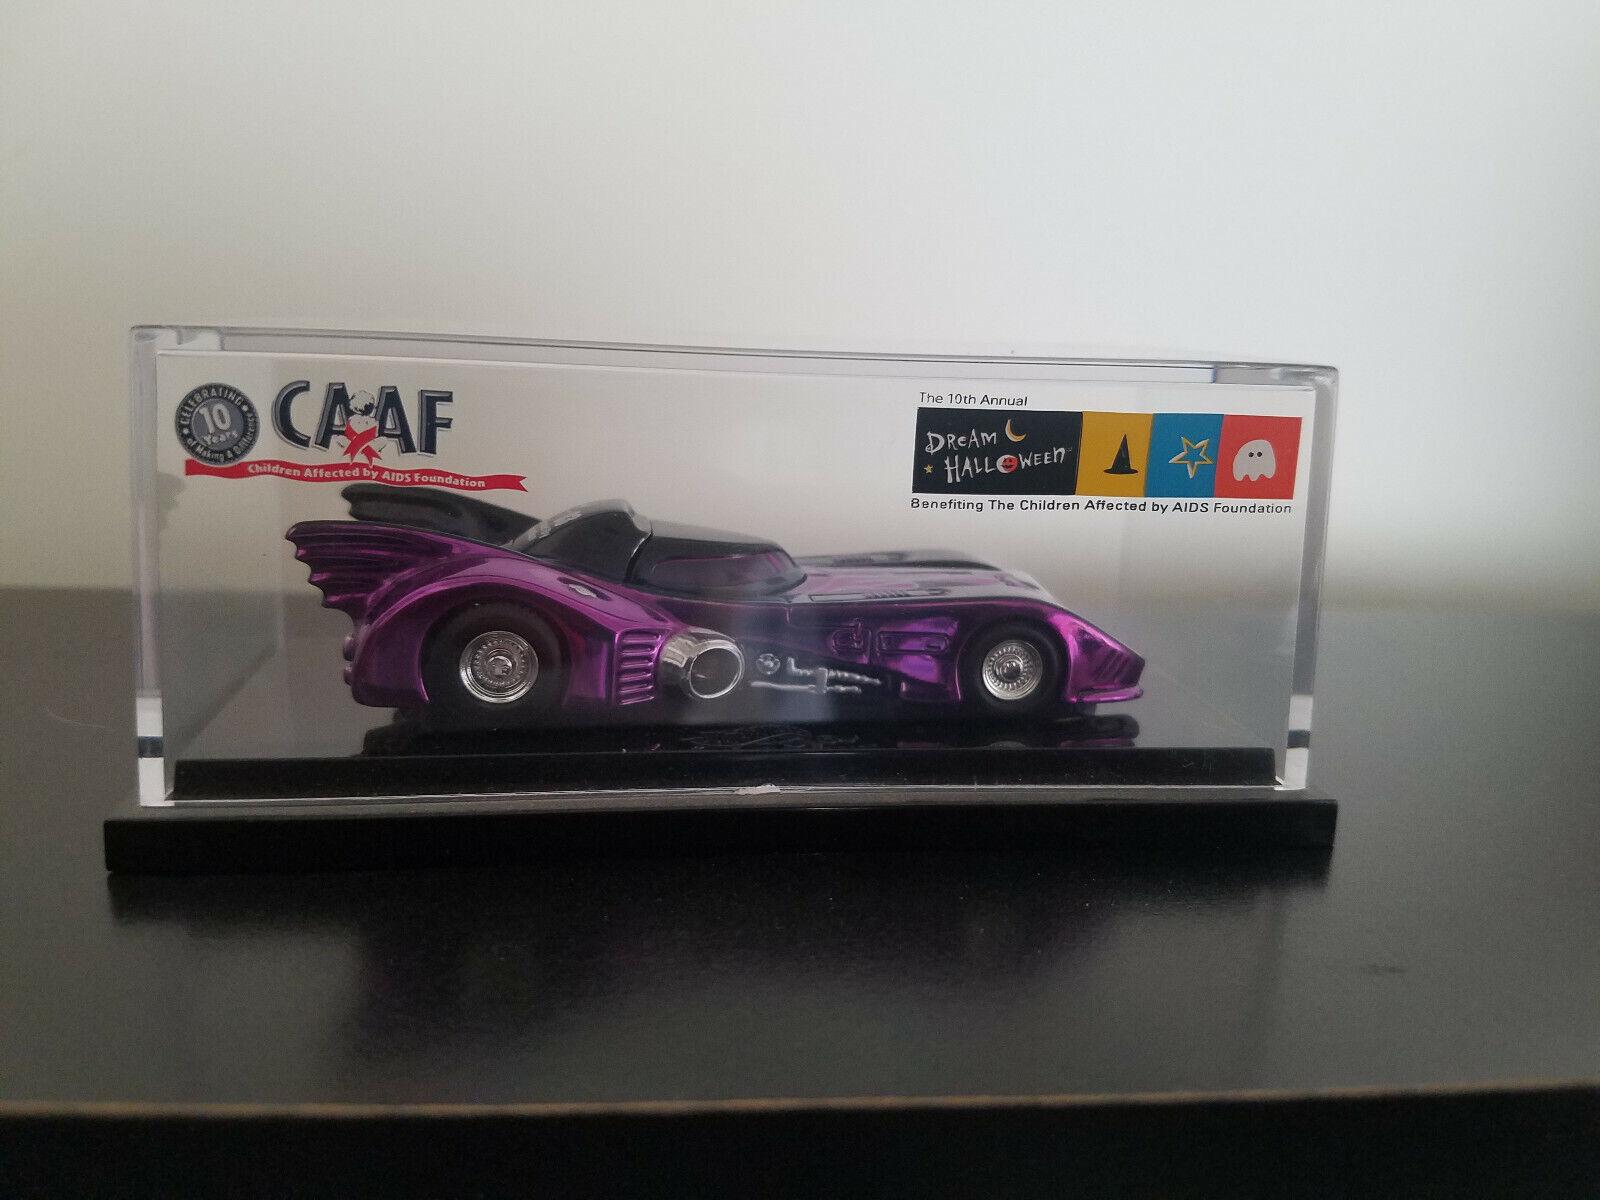 Hot Wheels 03 CAAF Dream Halloween Affinity Batmobile - Rare car, never opened.